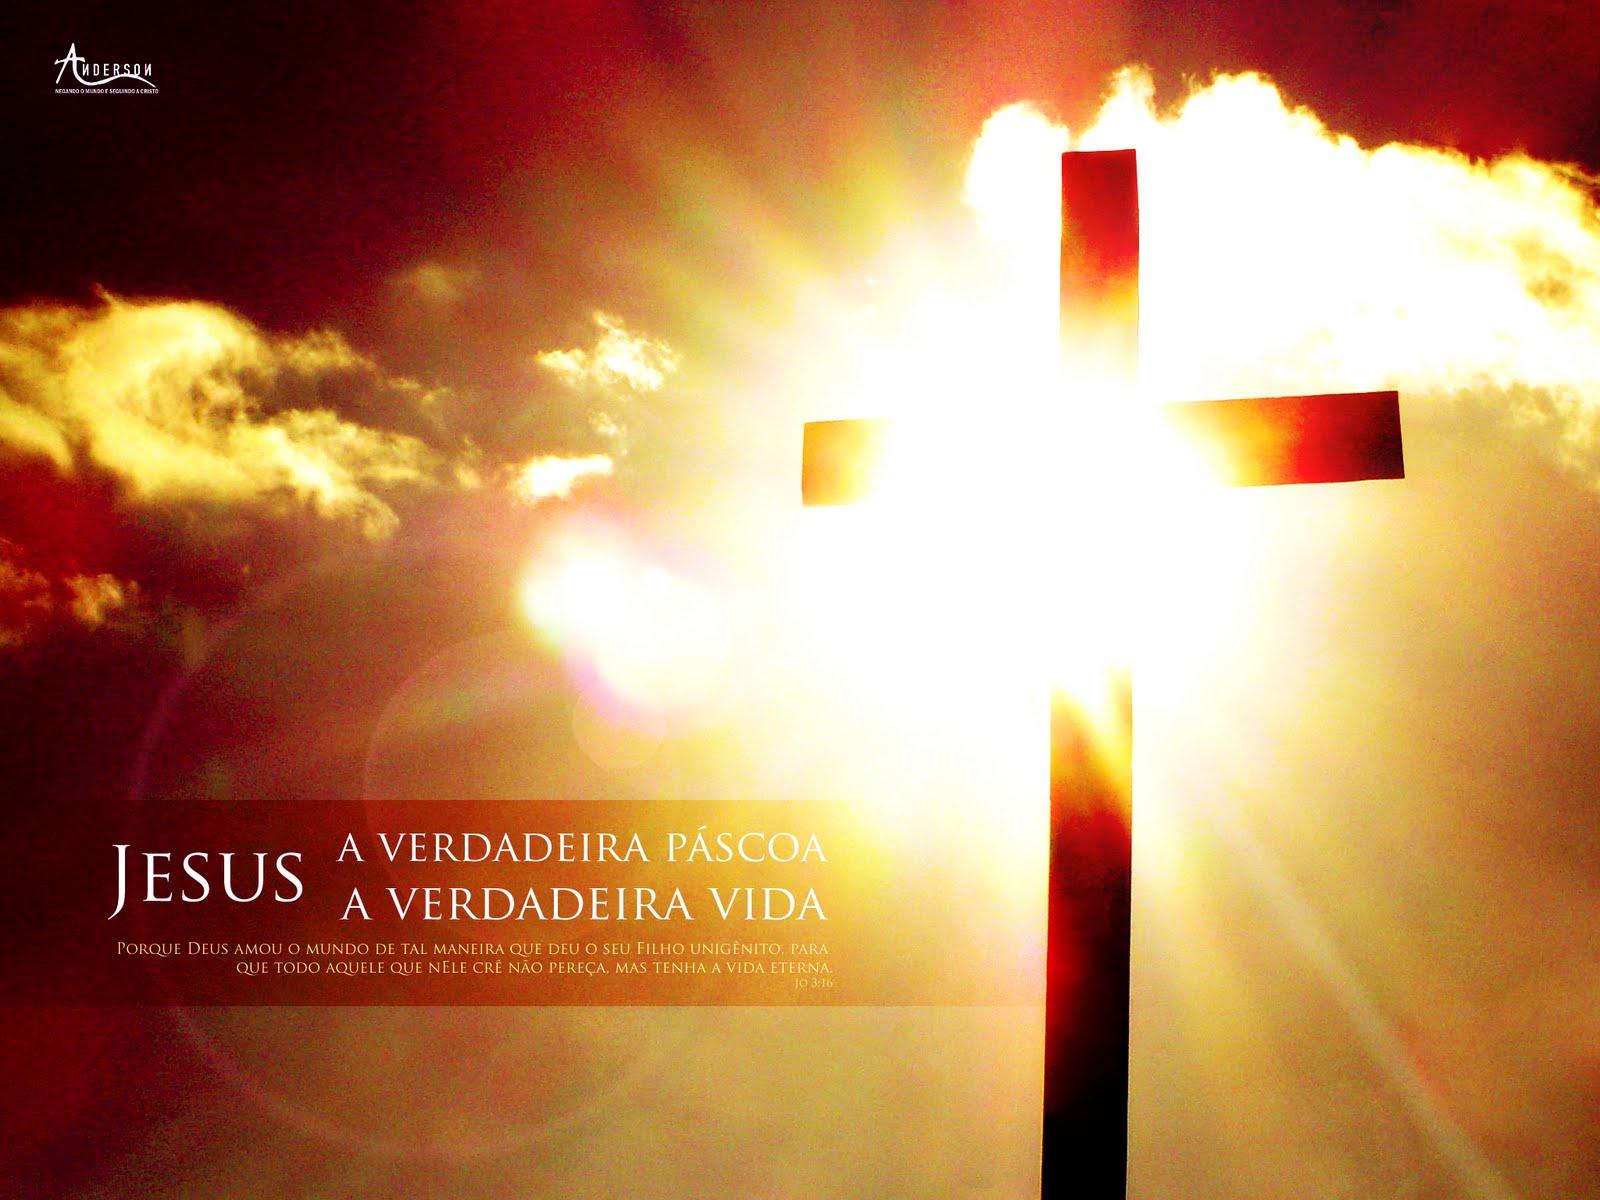 http://1.bp.blogspot.com/-N60RjOayS9w/T4GOfiNbwwI/AAAAAAAAAFE/VIuVLJoWPF0/s1600/Wallpaper+Jesus+a+verdadeira+vida.jpg